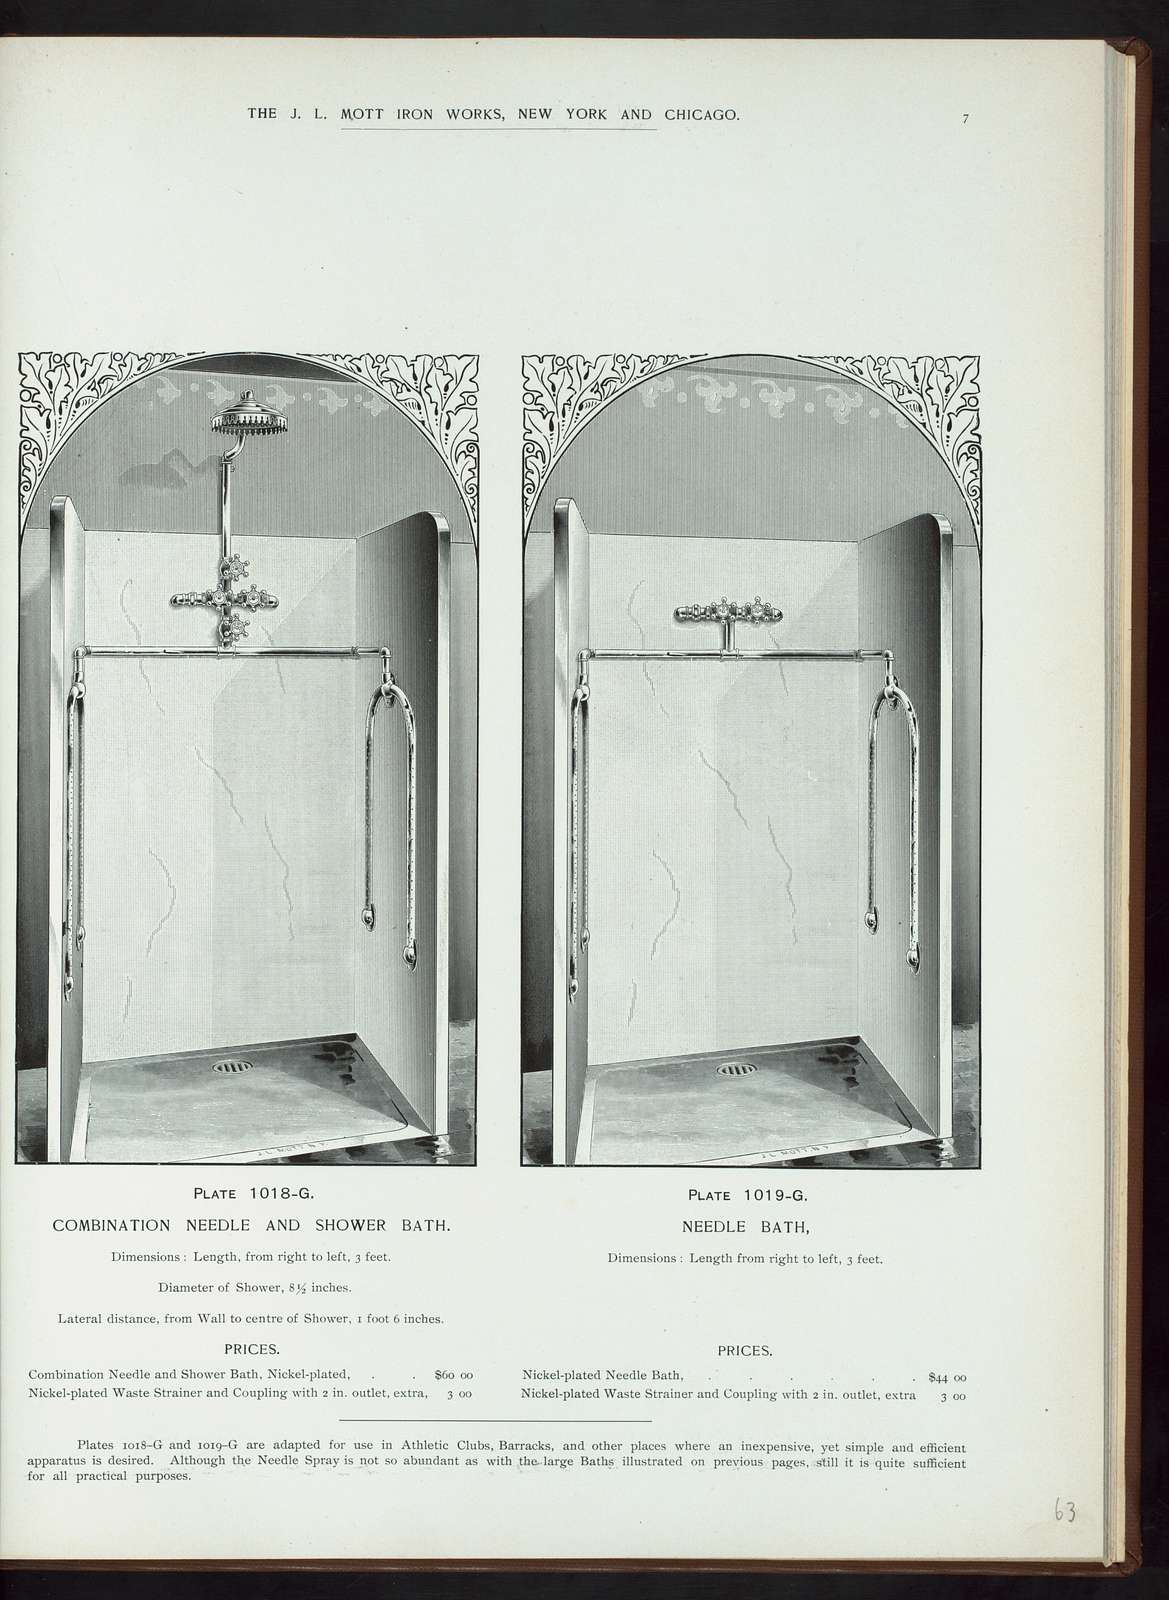 Combination needle and shower bath. Plate 1018-G ; Needle bath. Plath 1019-G.